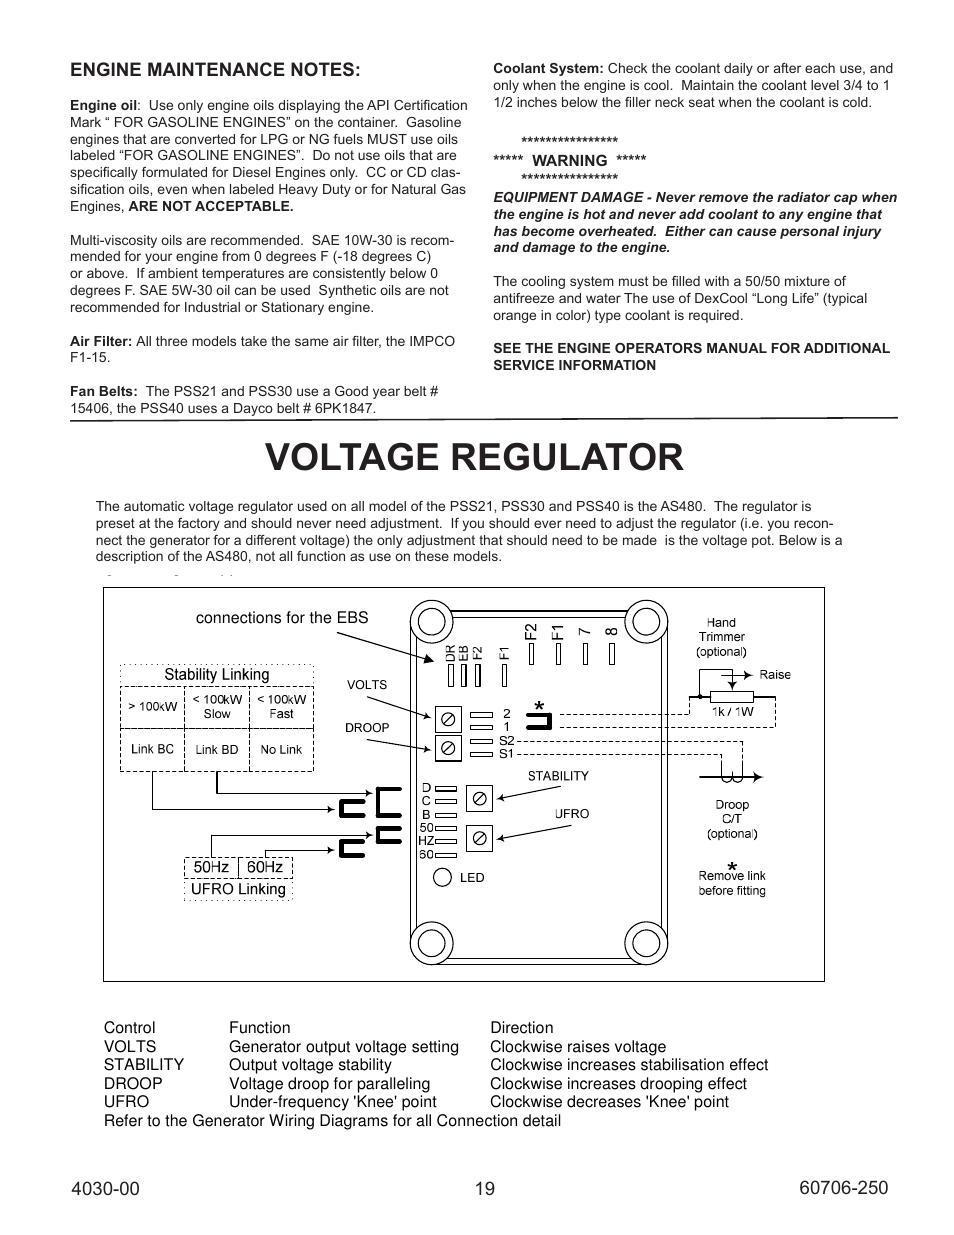 medium resolution of voltage regulator automatic voltage regulator avr winco ulpss40 i with dse 7310 engine control 2014 user manual page 19 24